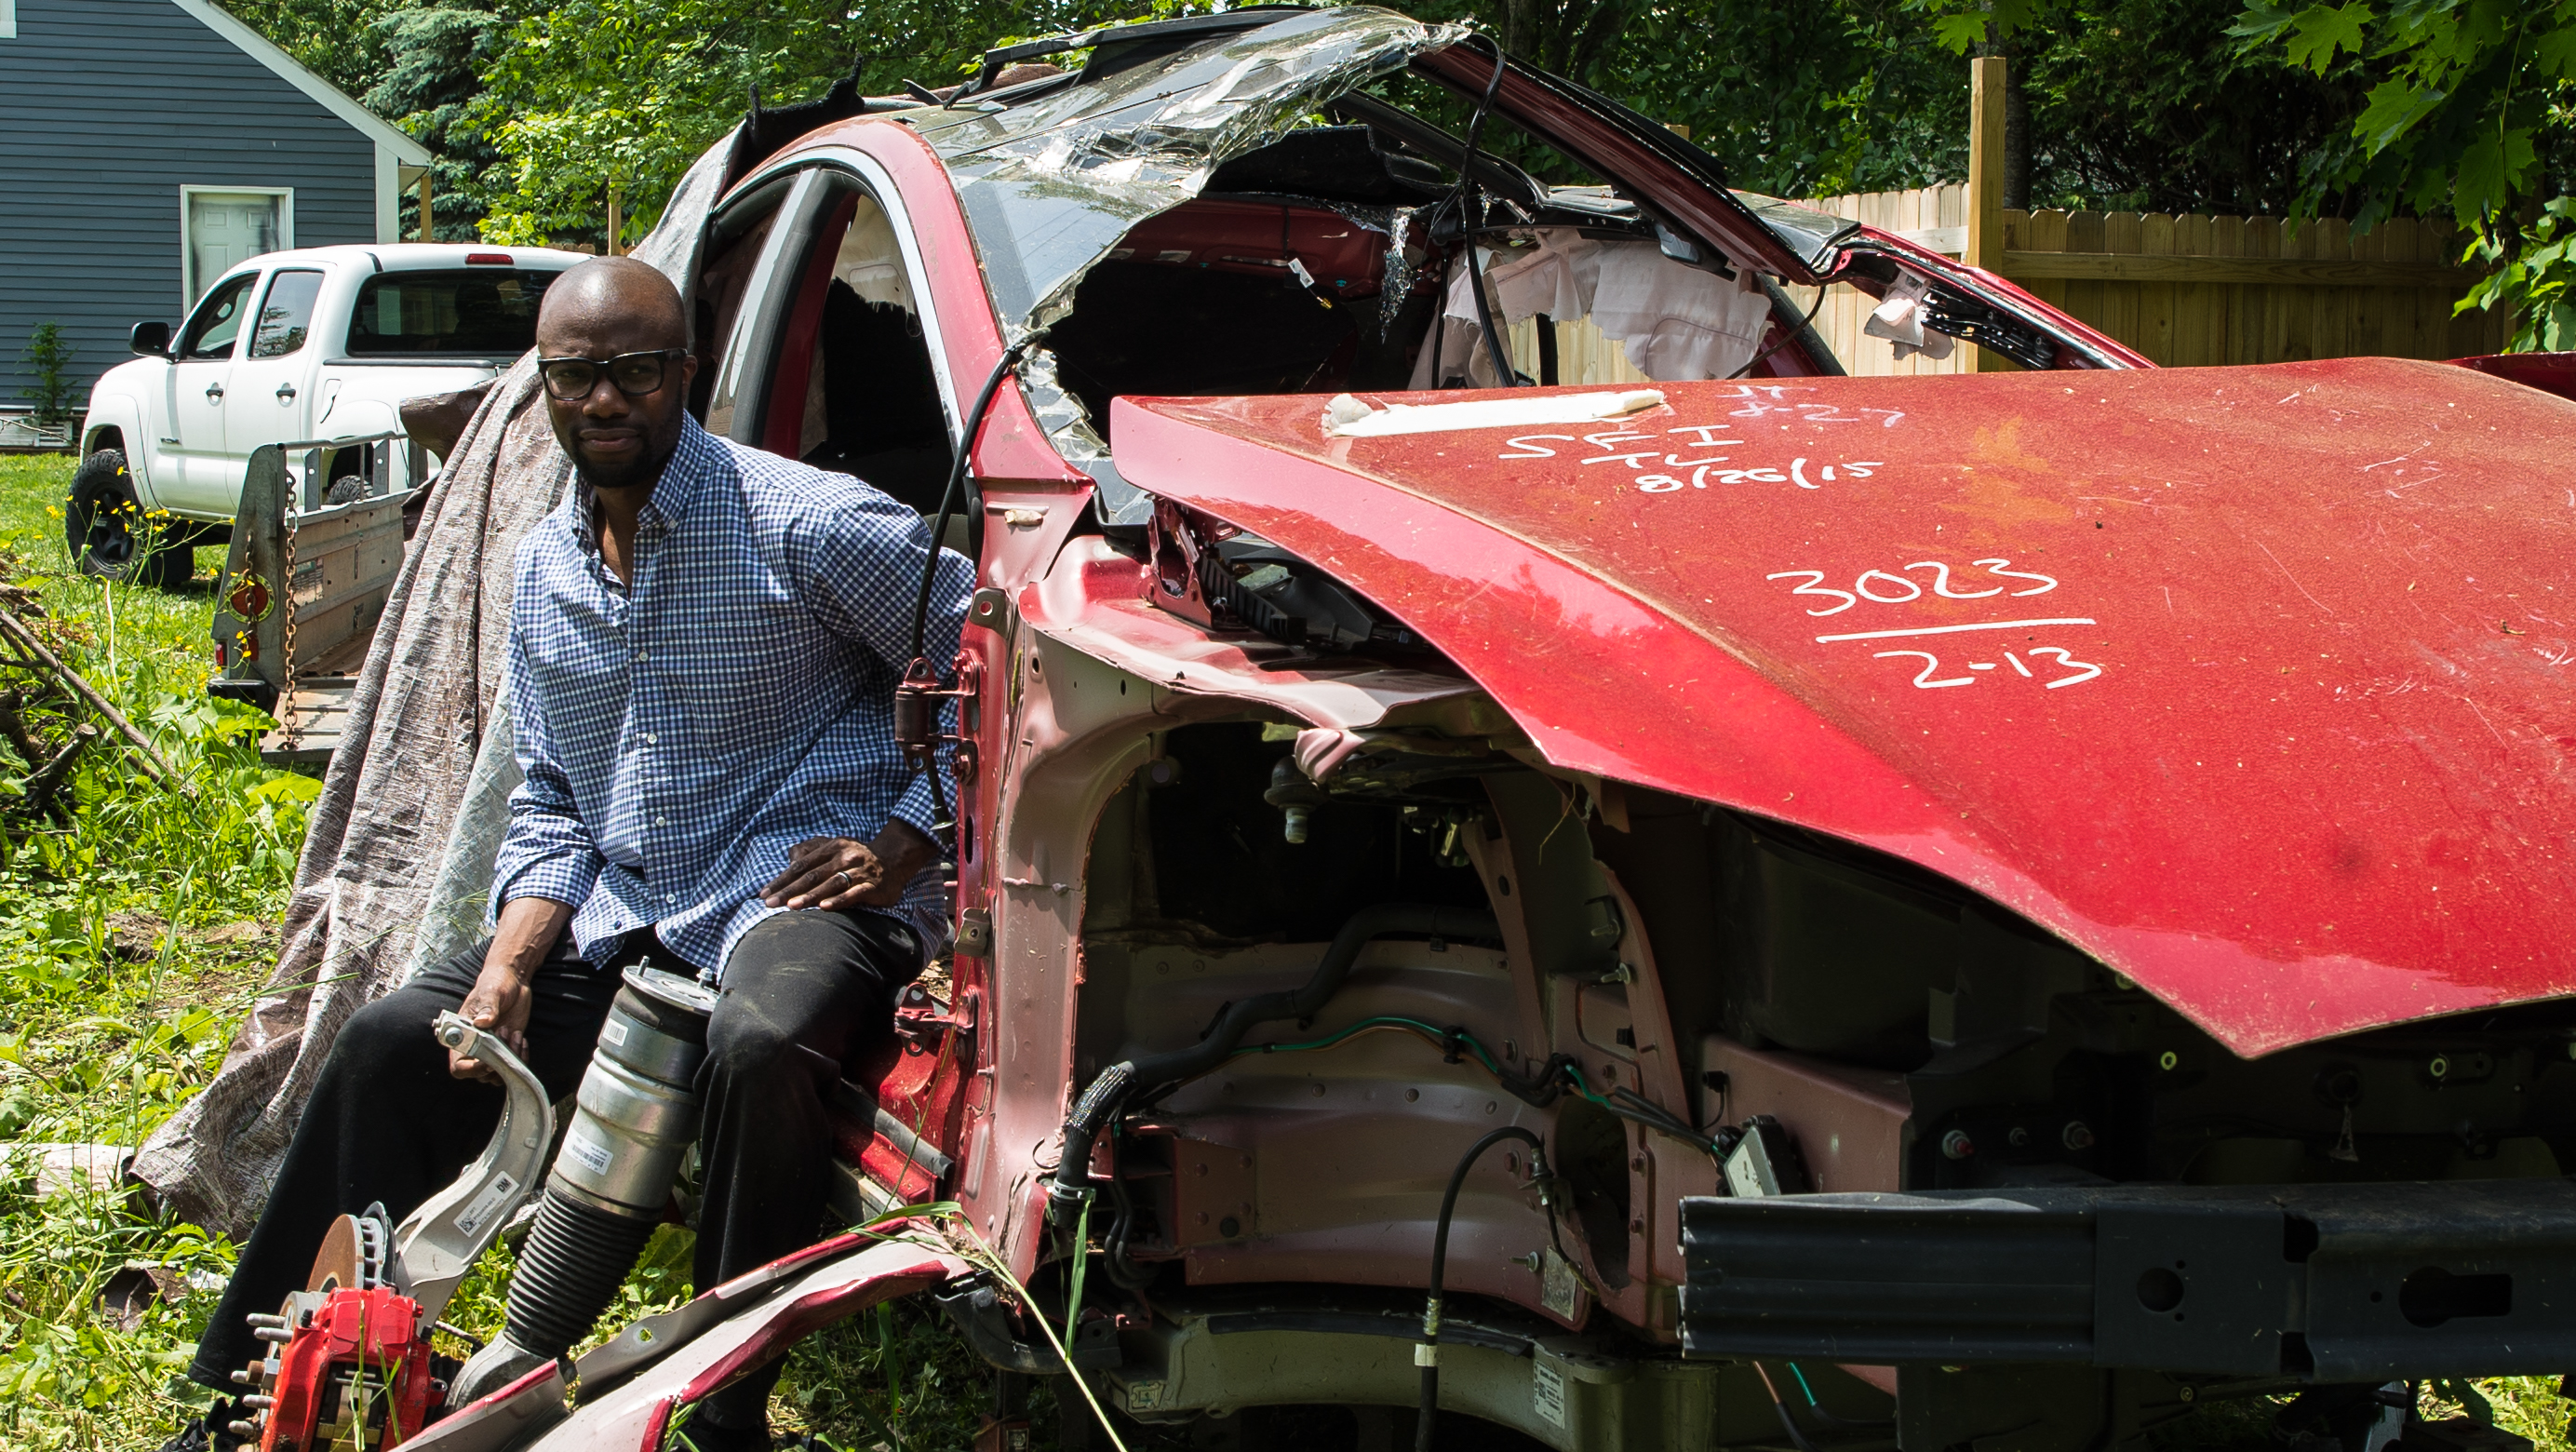 The Rogue Tesla Mechanic Resurrecting Salvaged Cars - VICE